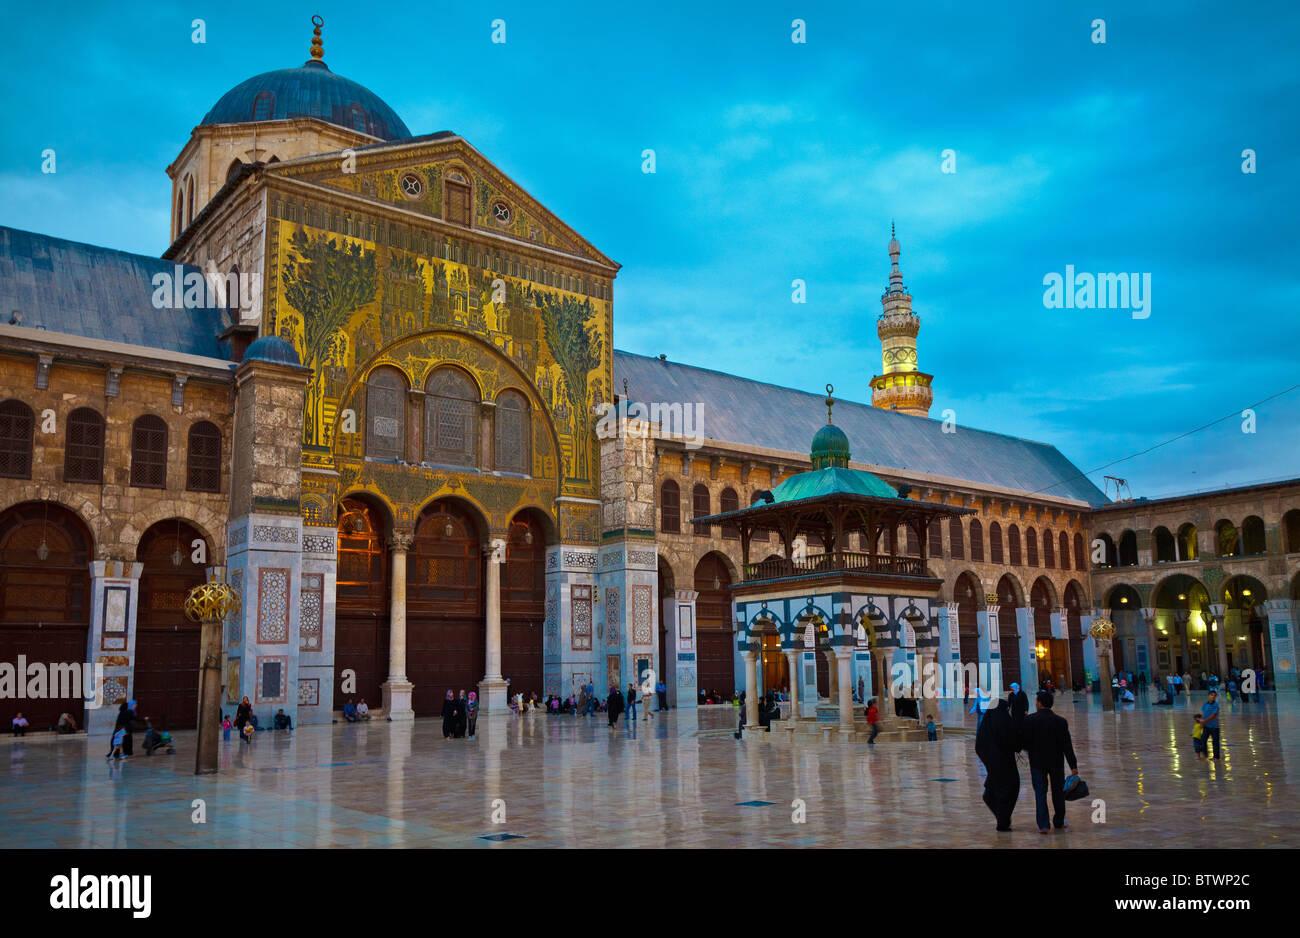 The great Umayad Mosqued Damascus, Syria at night - Stock Image